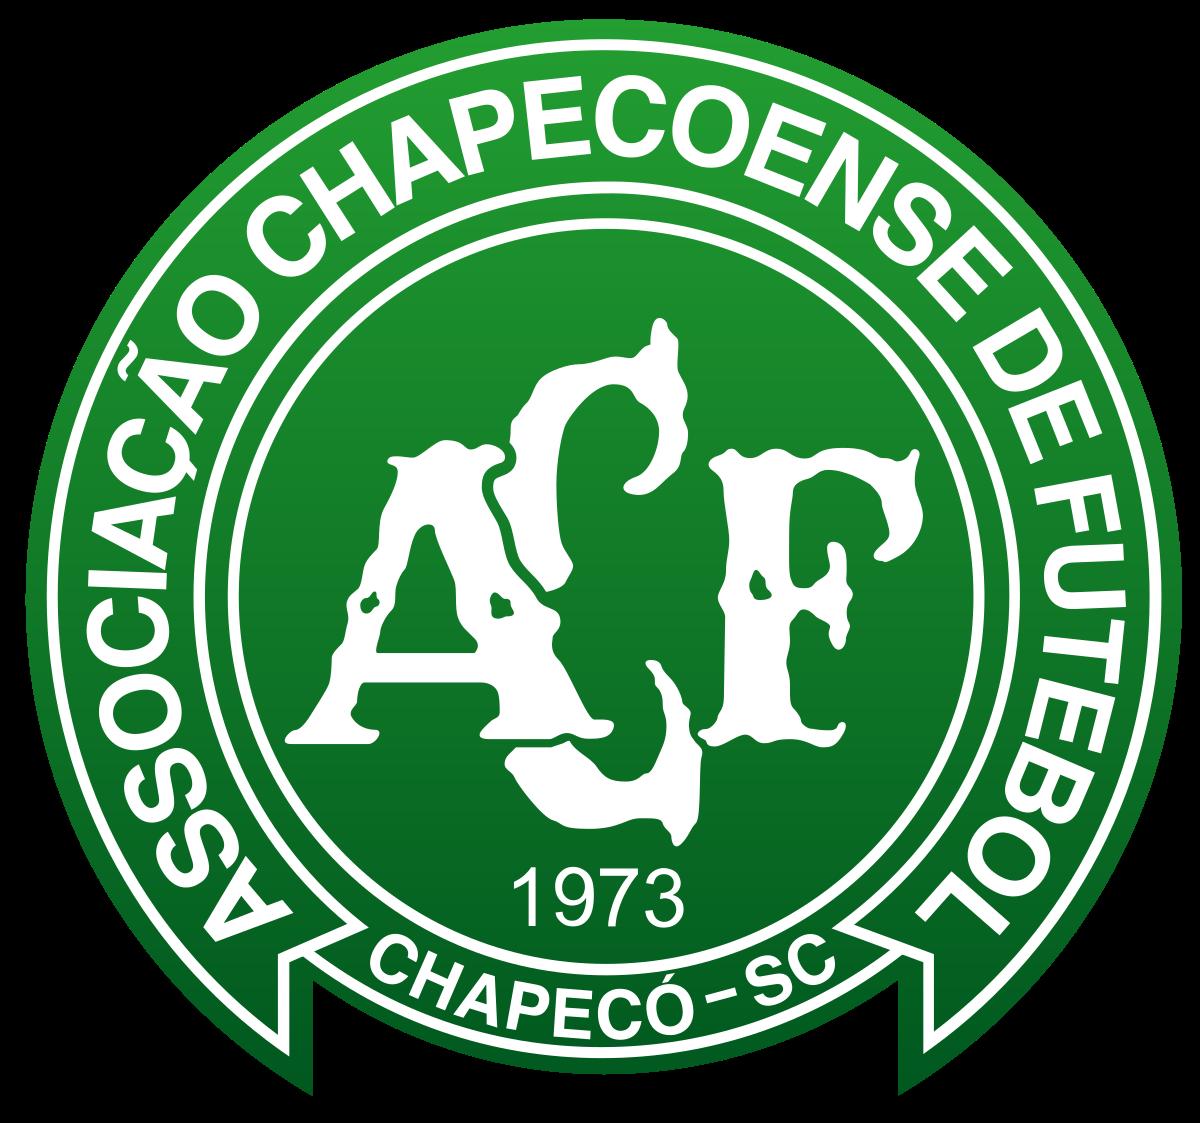 Fc Chapecoense